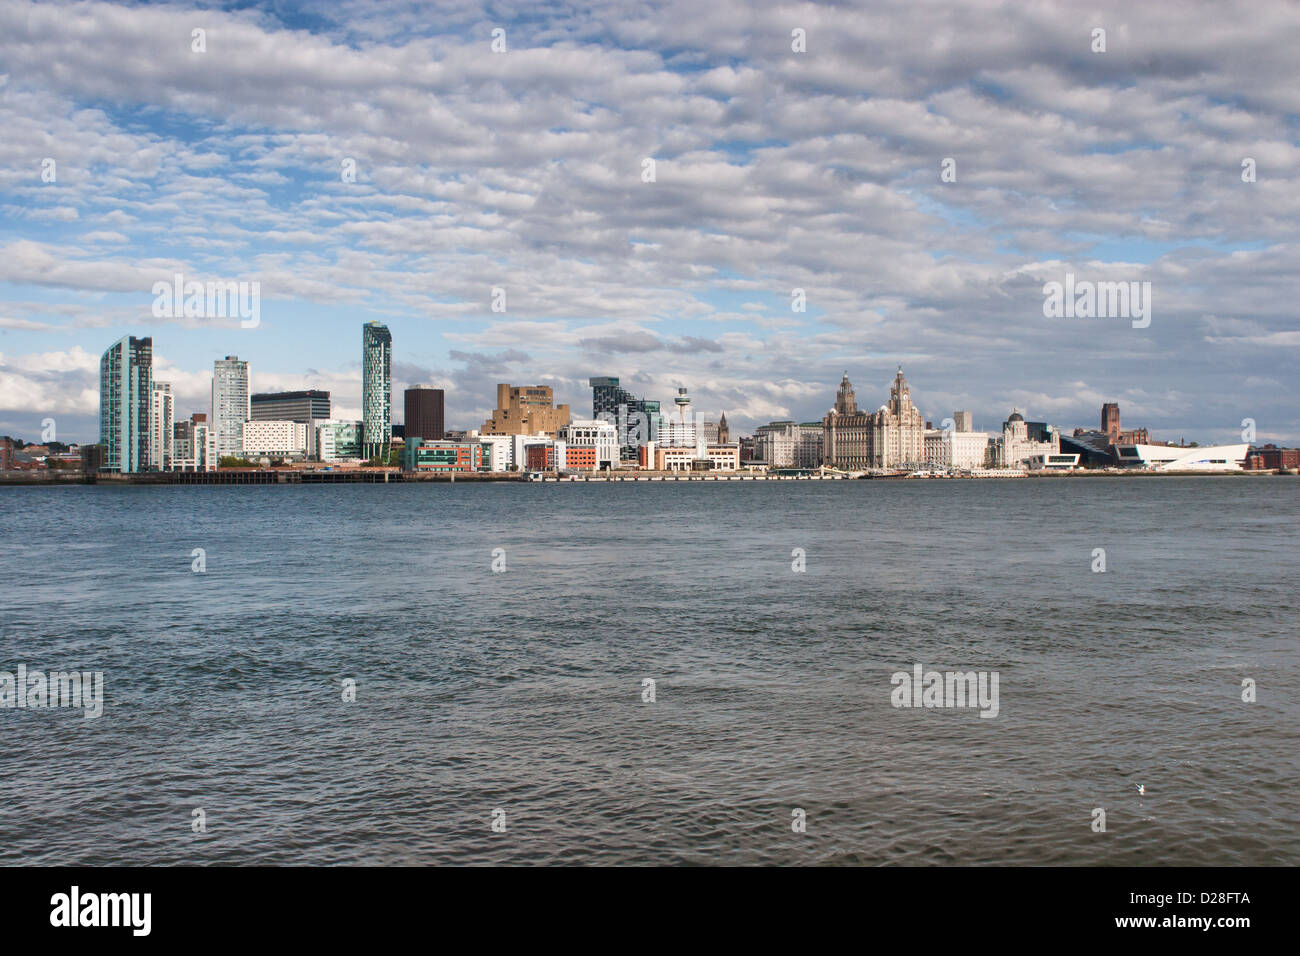 Liverpool skyline taken across the River Mersey - Stock Image